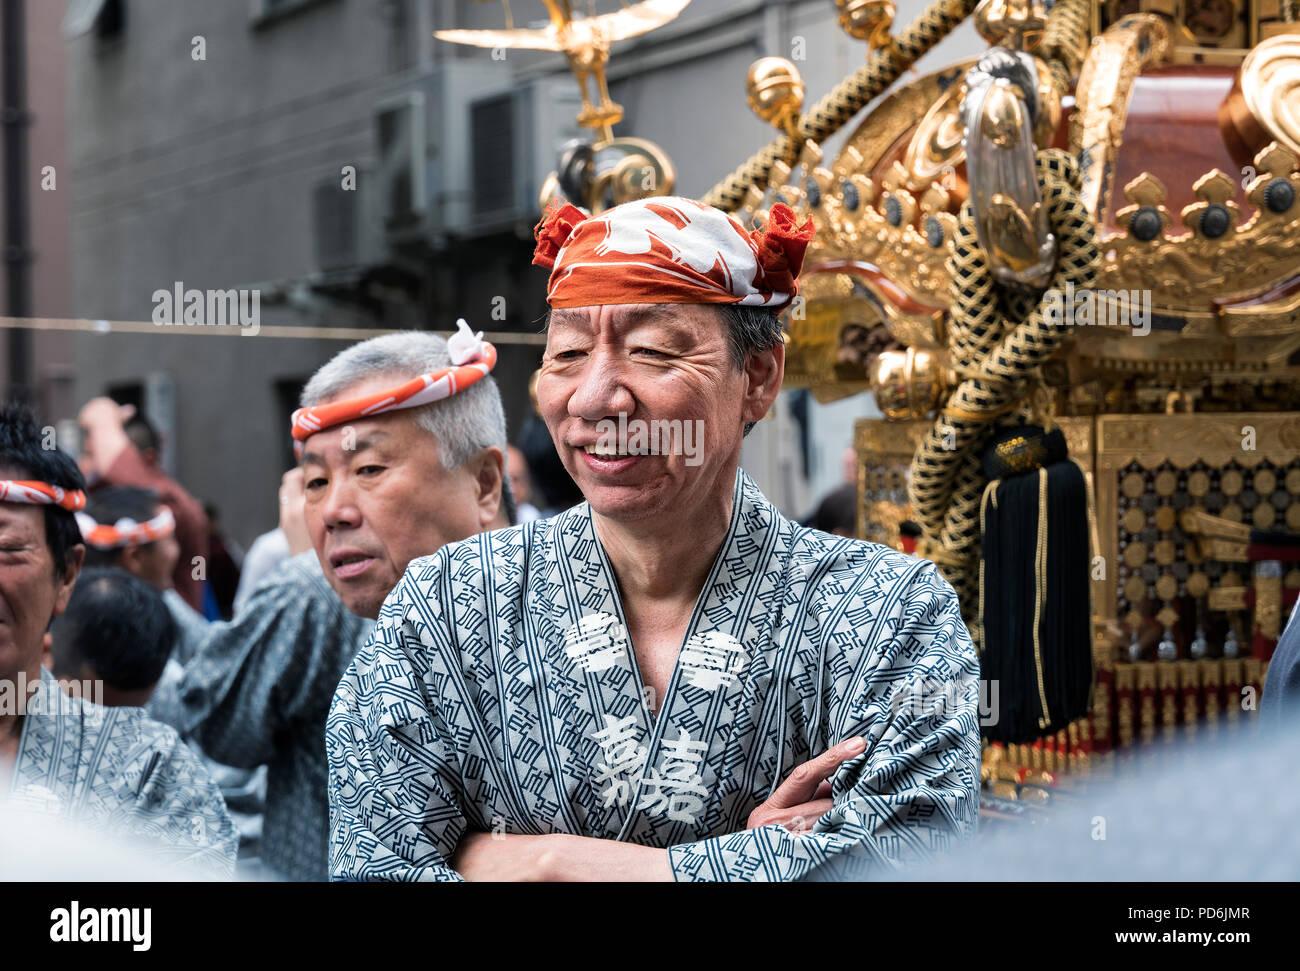 Giappone, isola di Honshu, Kanto, Tokyo, il Kanda Matsuri. Immagini Stock